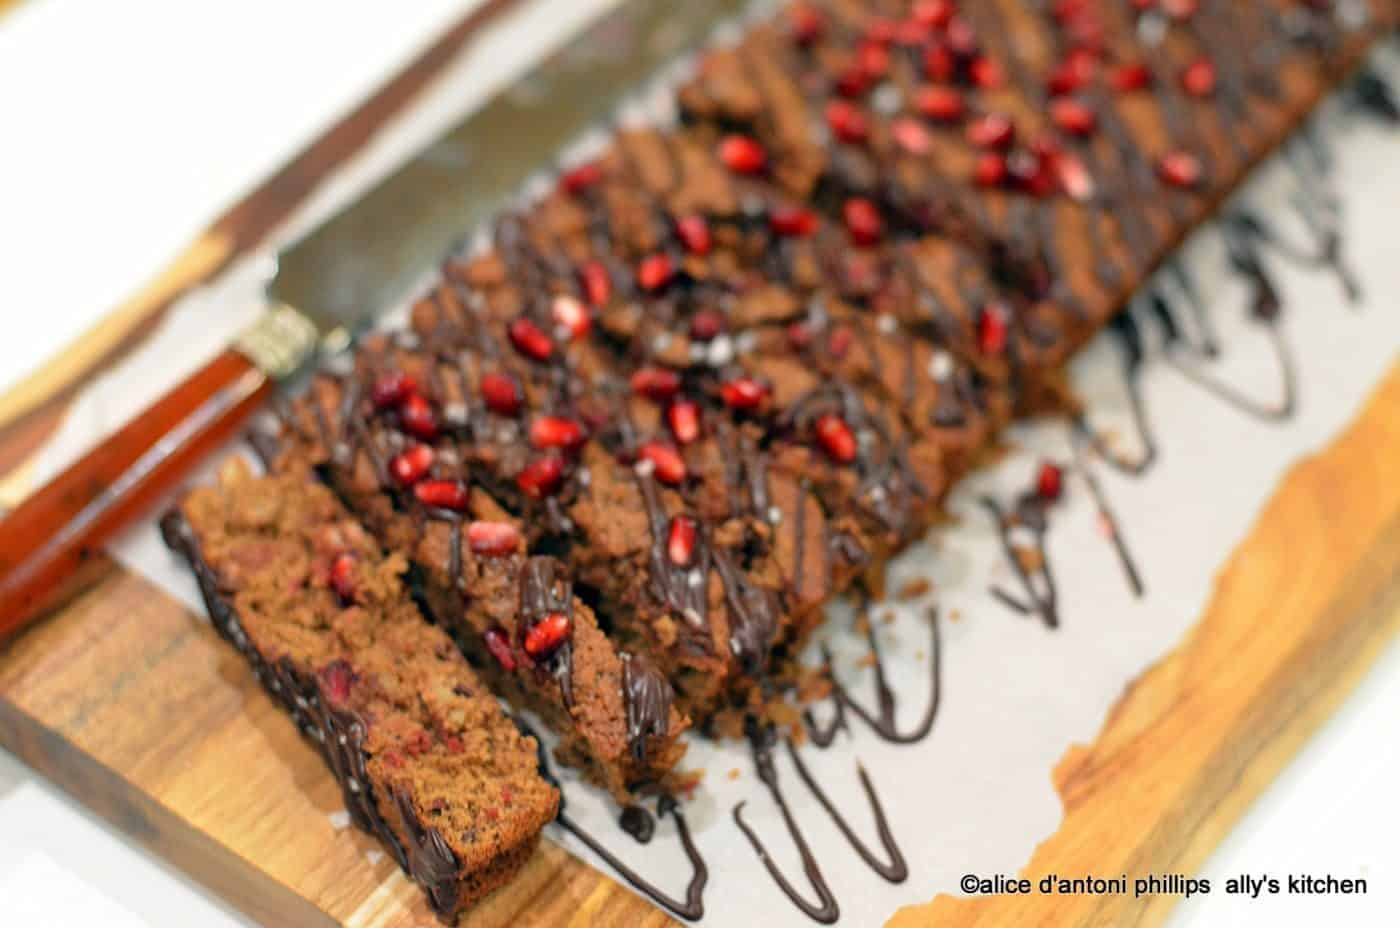 Bourbon Chocolate & Pomegranate Cake YummmeeZ